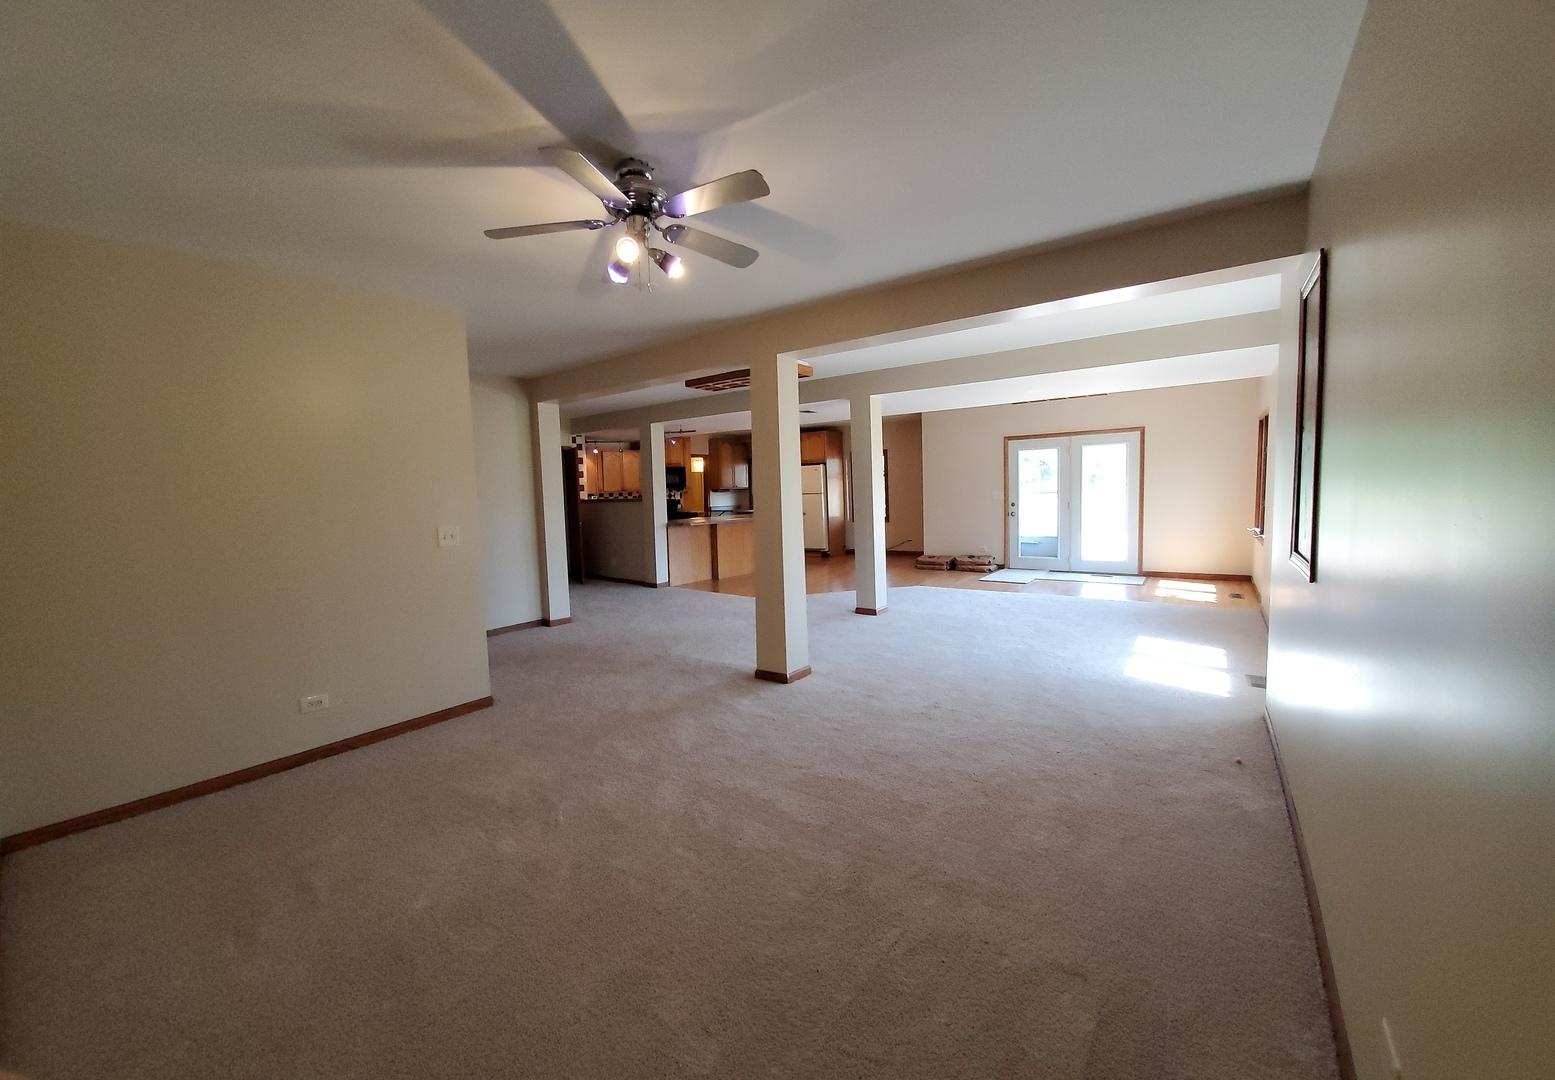 39w348 Grand ,Elgin, Illinois 60124